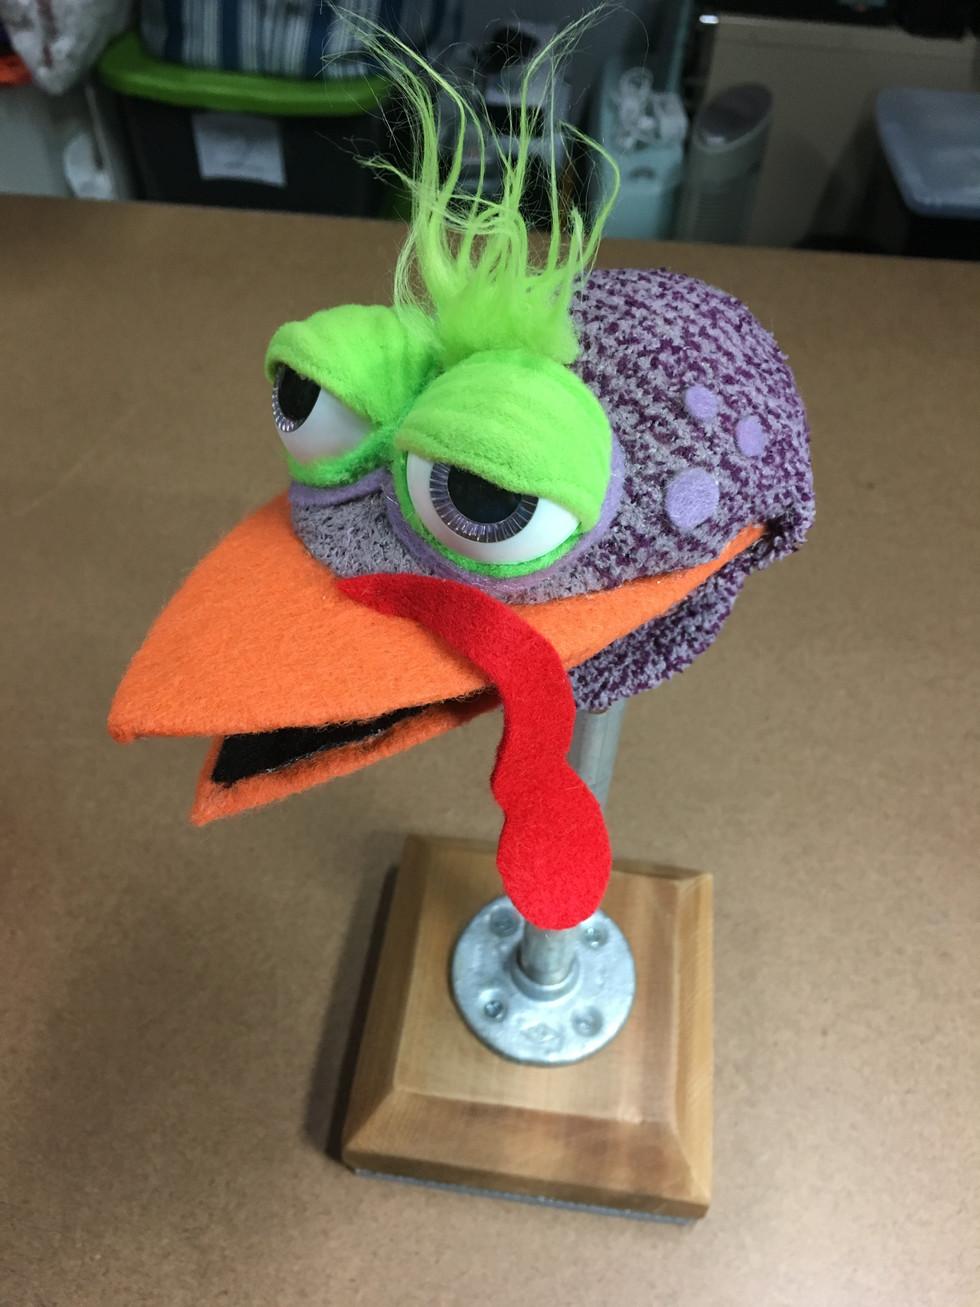 Turkey Puppet Build